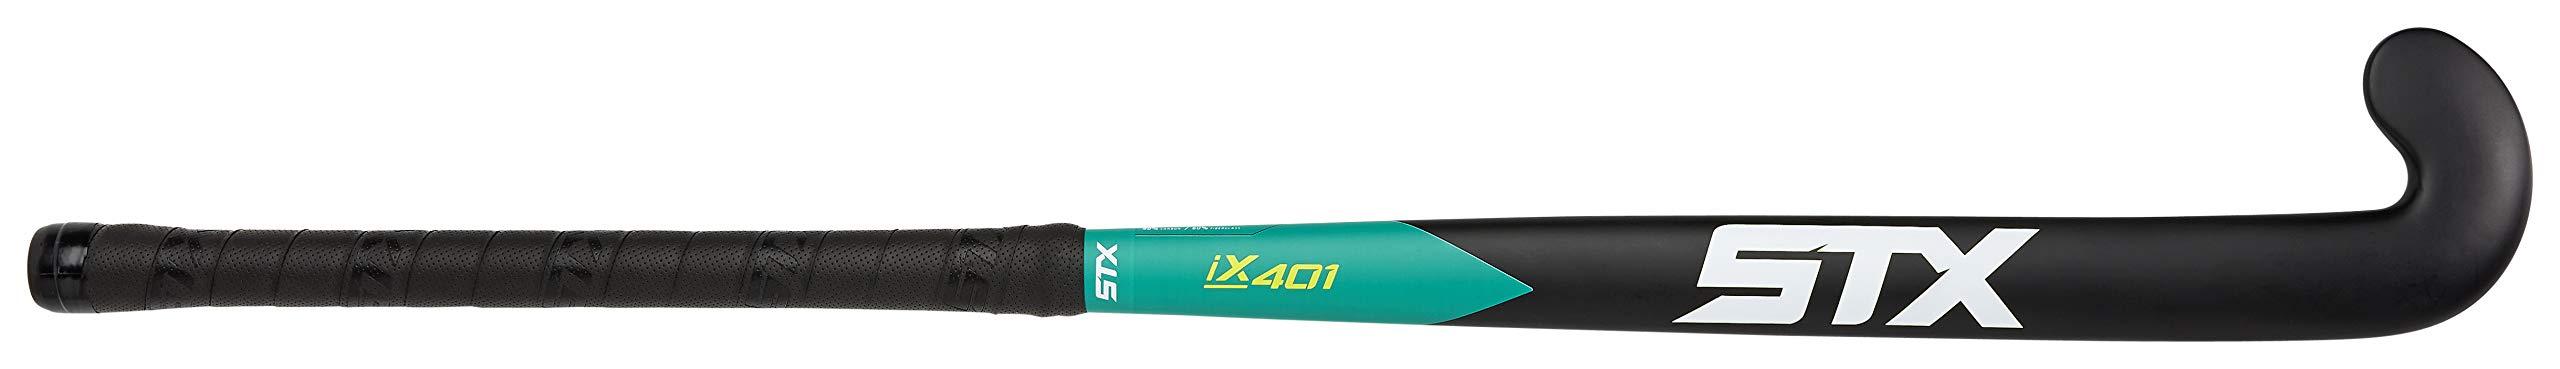 STX Field Hockey Indoor Stick